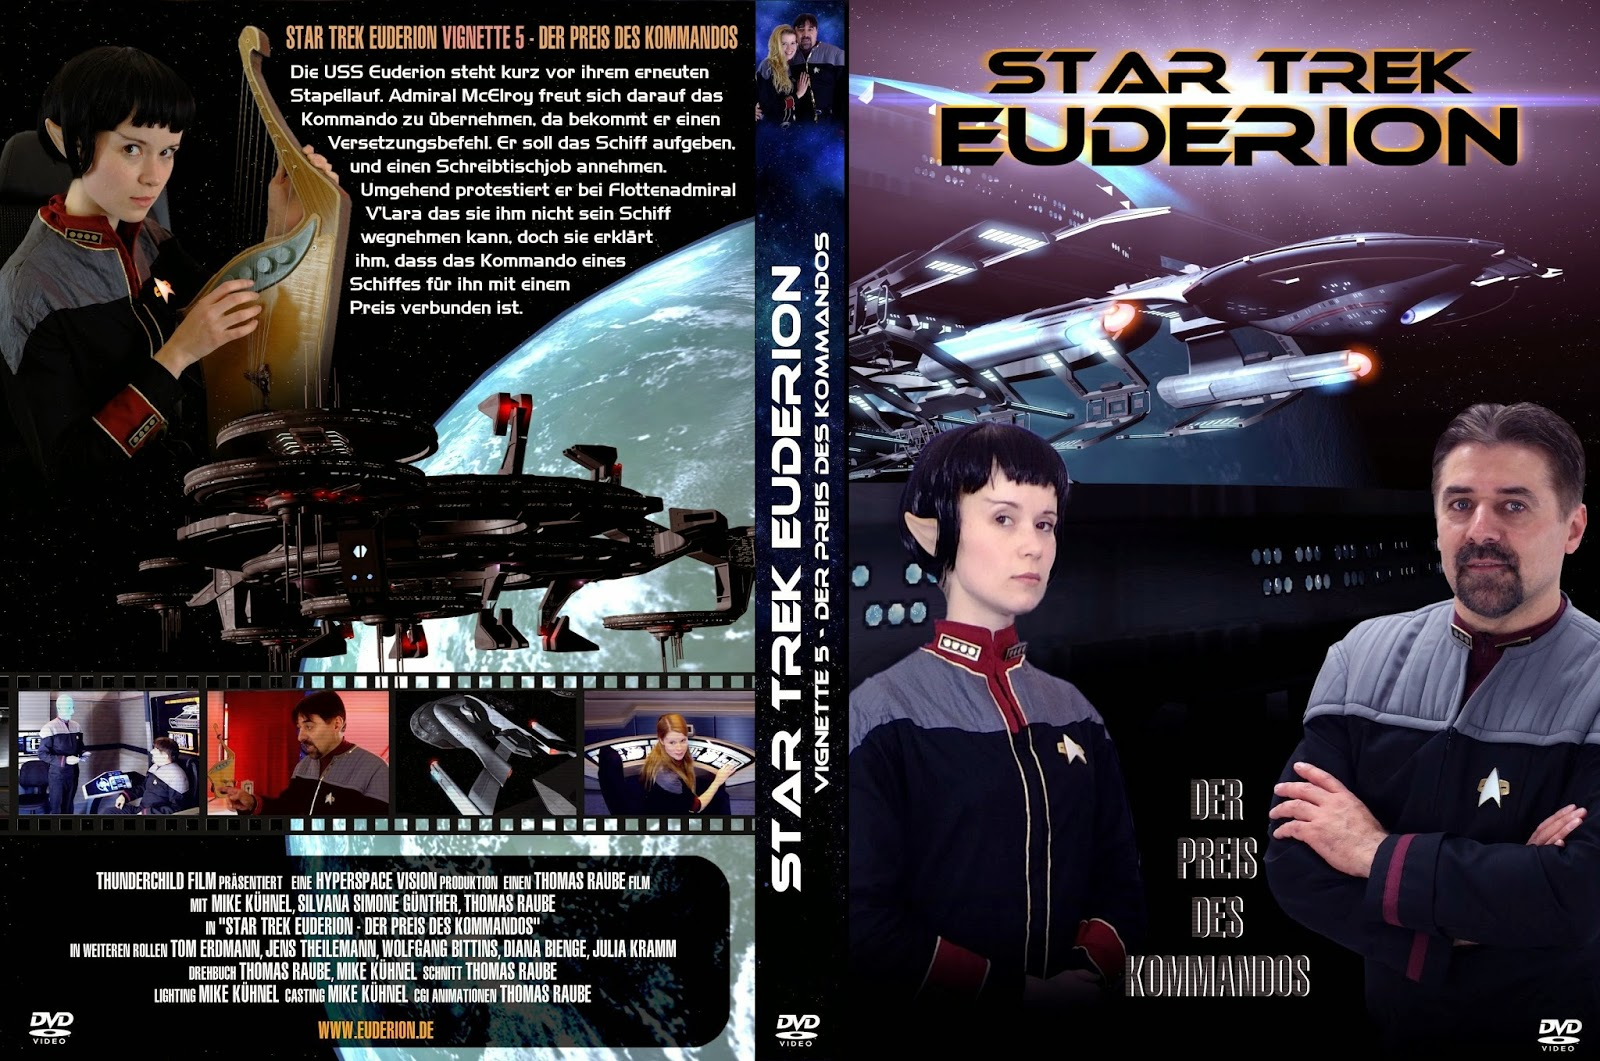 Star trek renegades release date in Brisbane